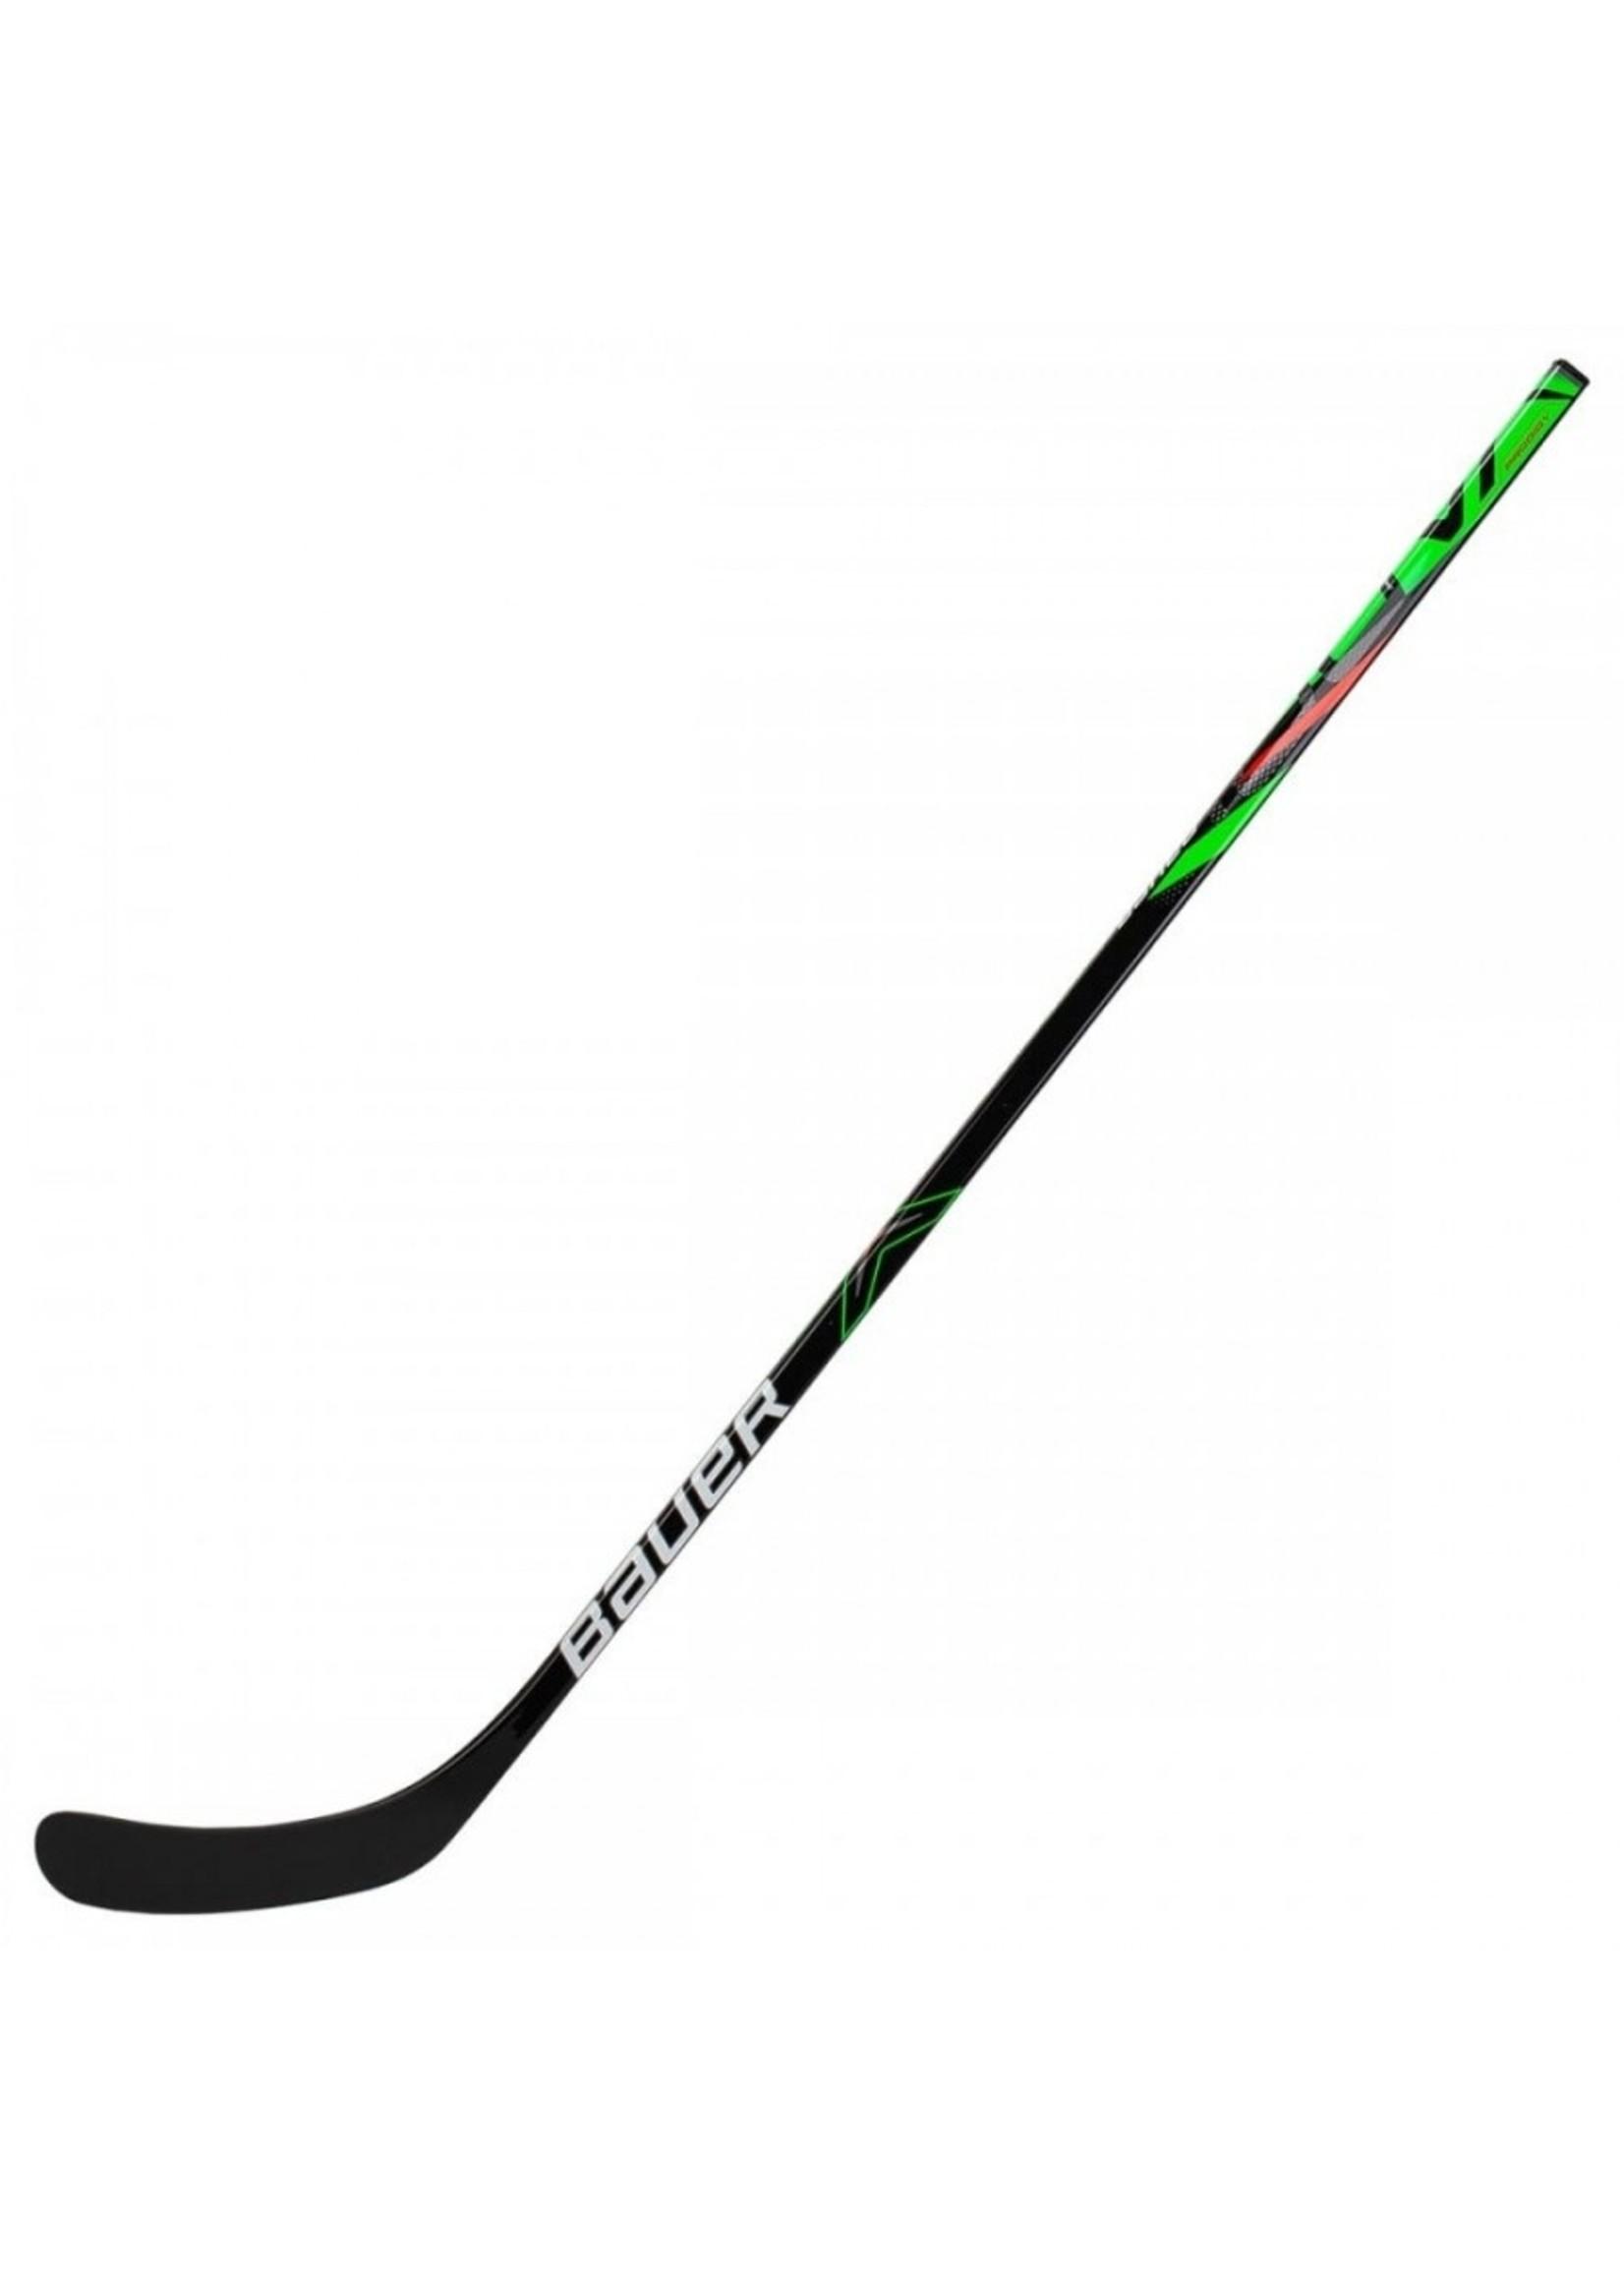 Bauer Hockey BAUER S19 VAPOR PRODIGY 30 FLEX JR STICK